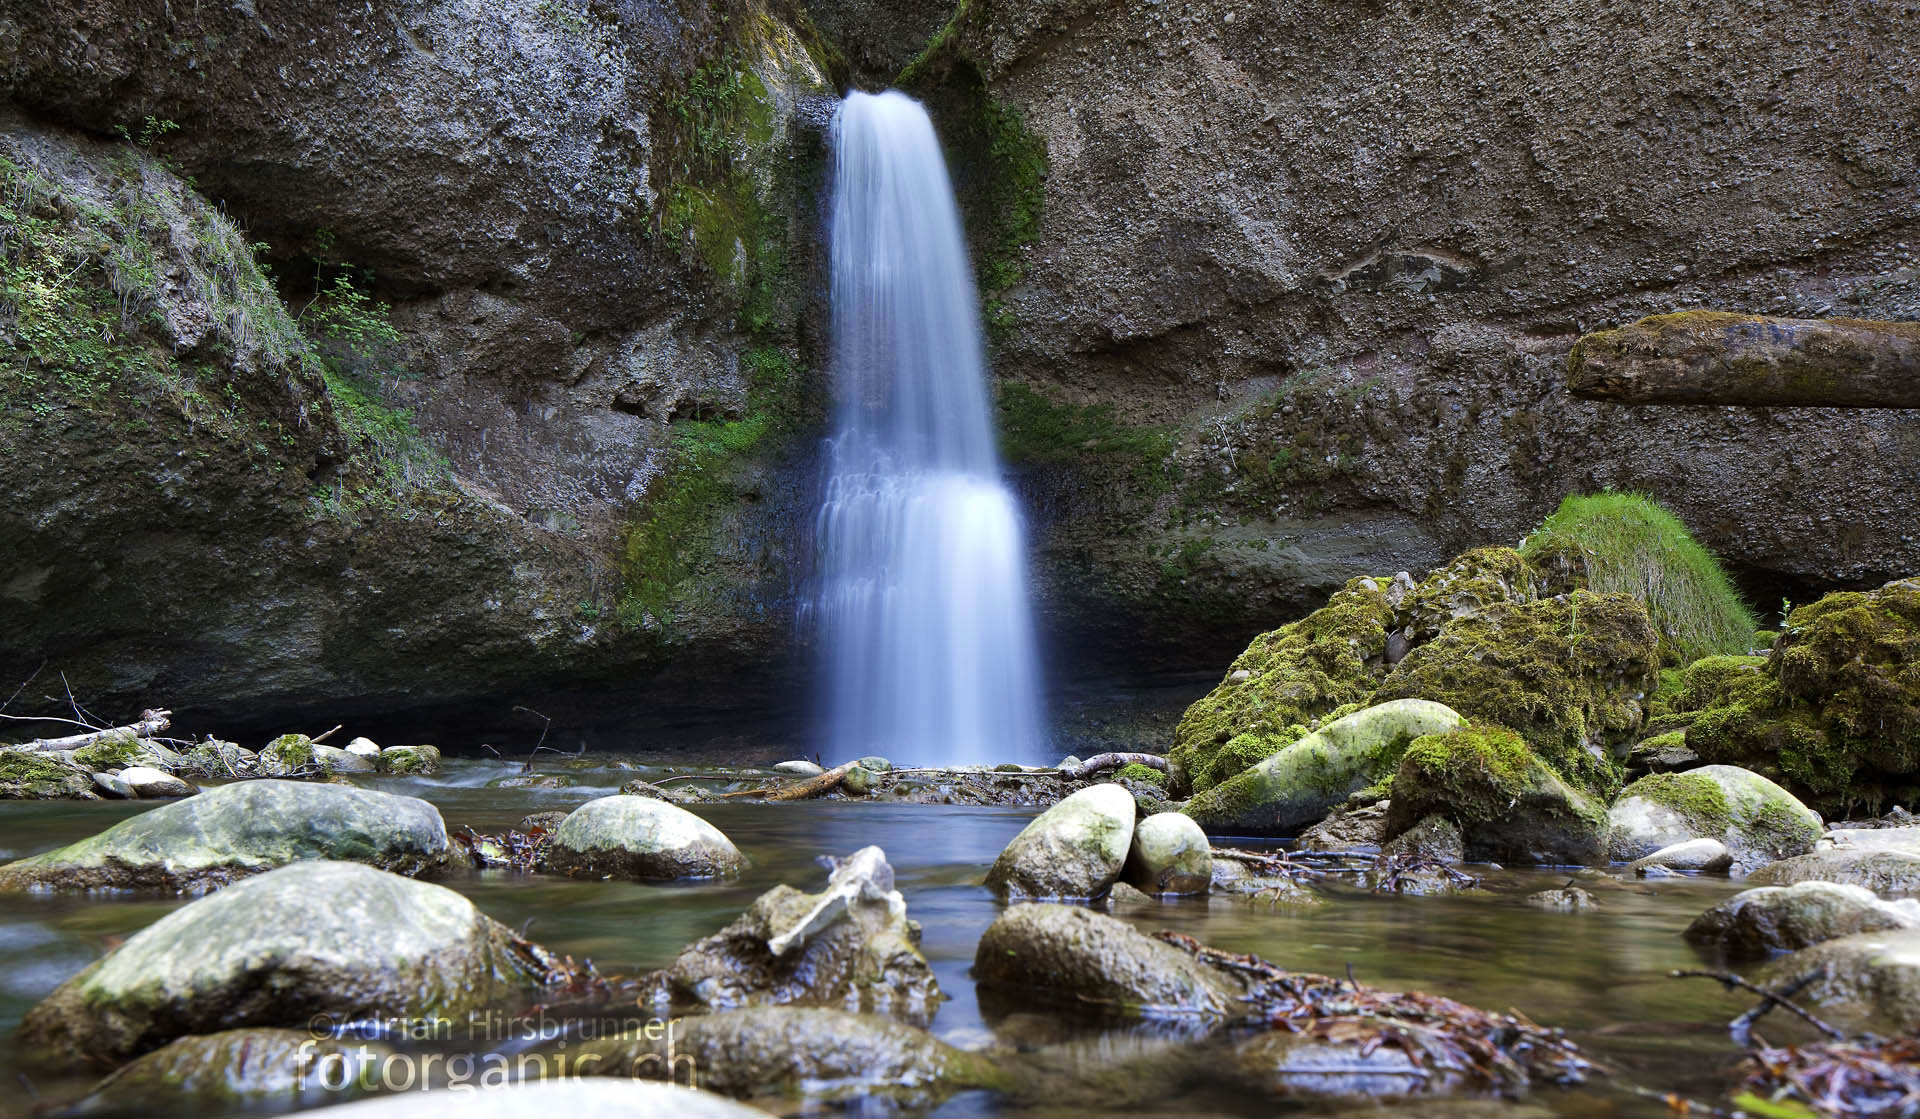 Wasserfall Rotache Fahrni